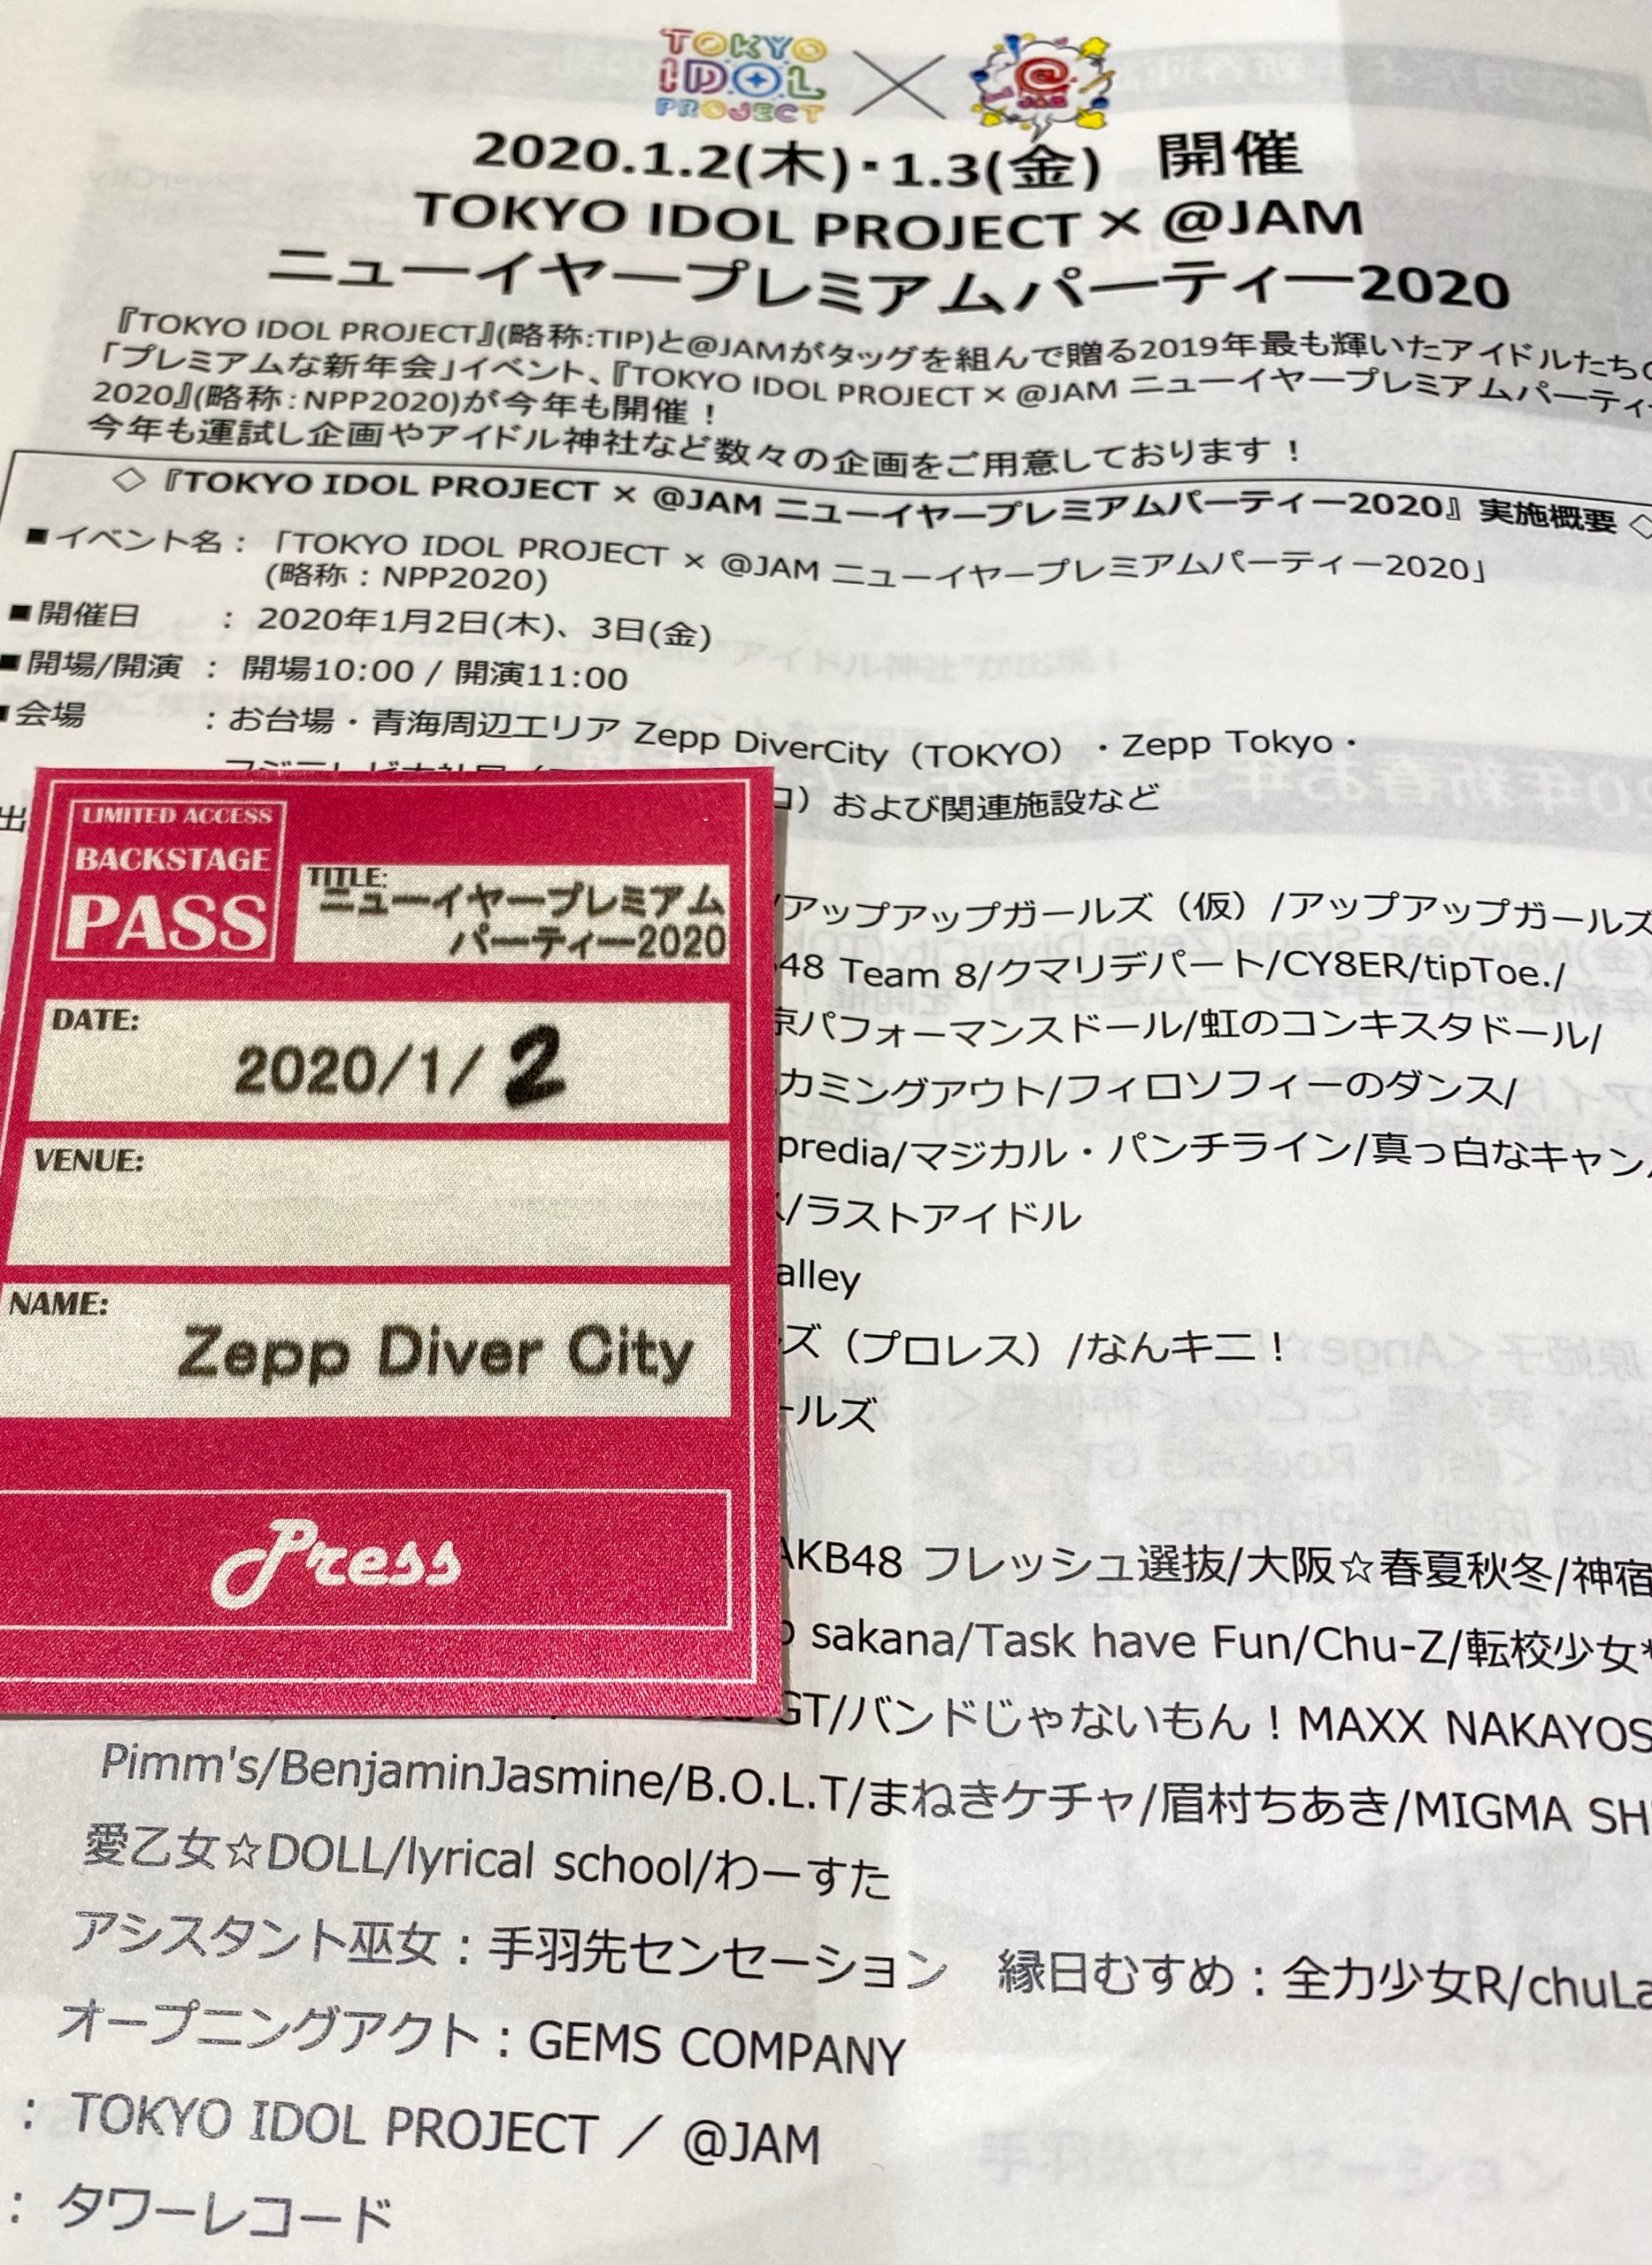 JAPAN JANUARY 2-3, 2020-1